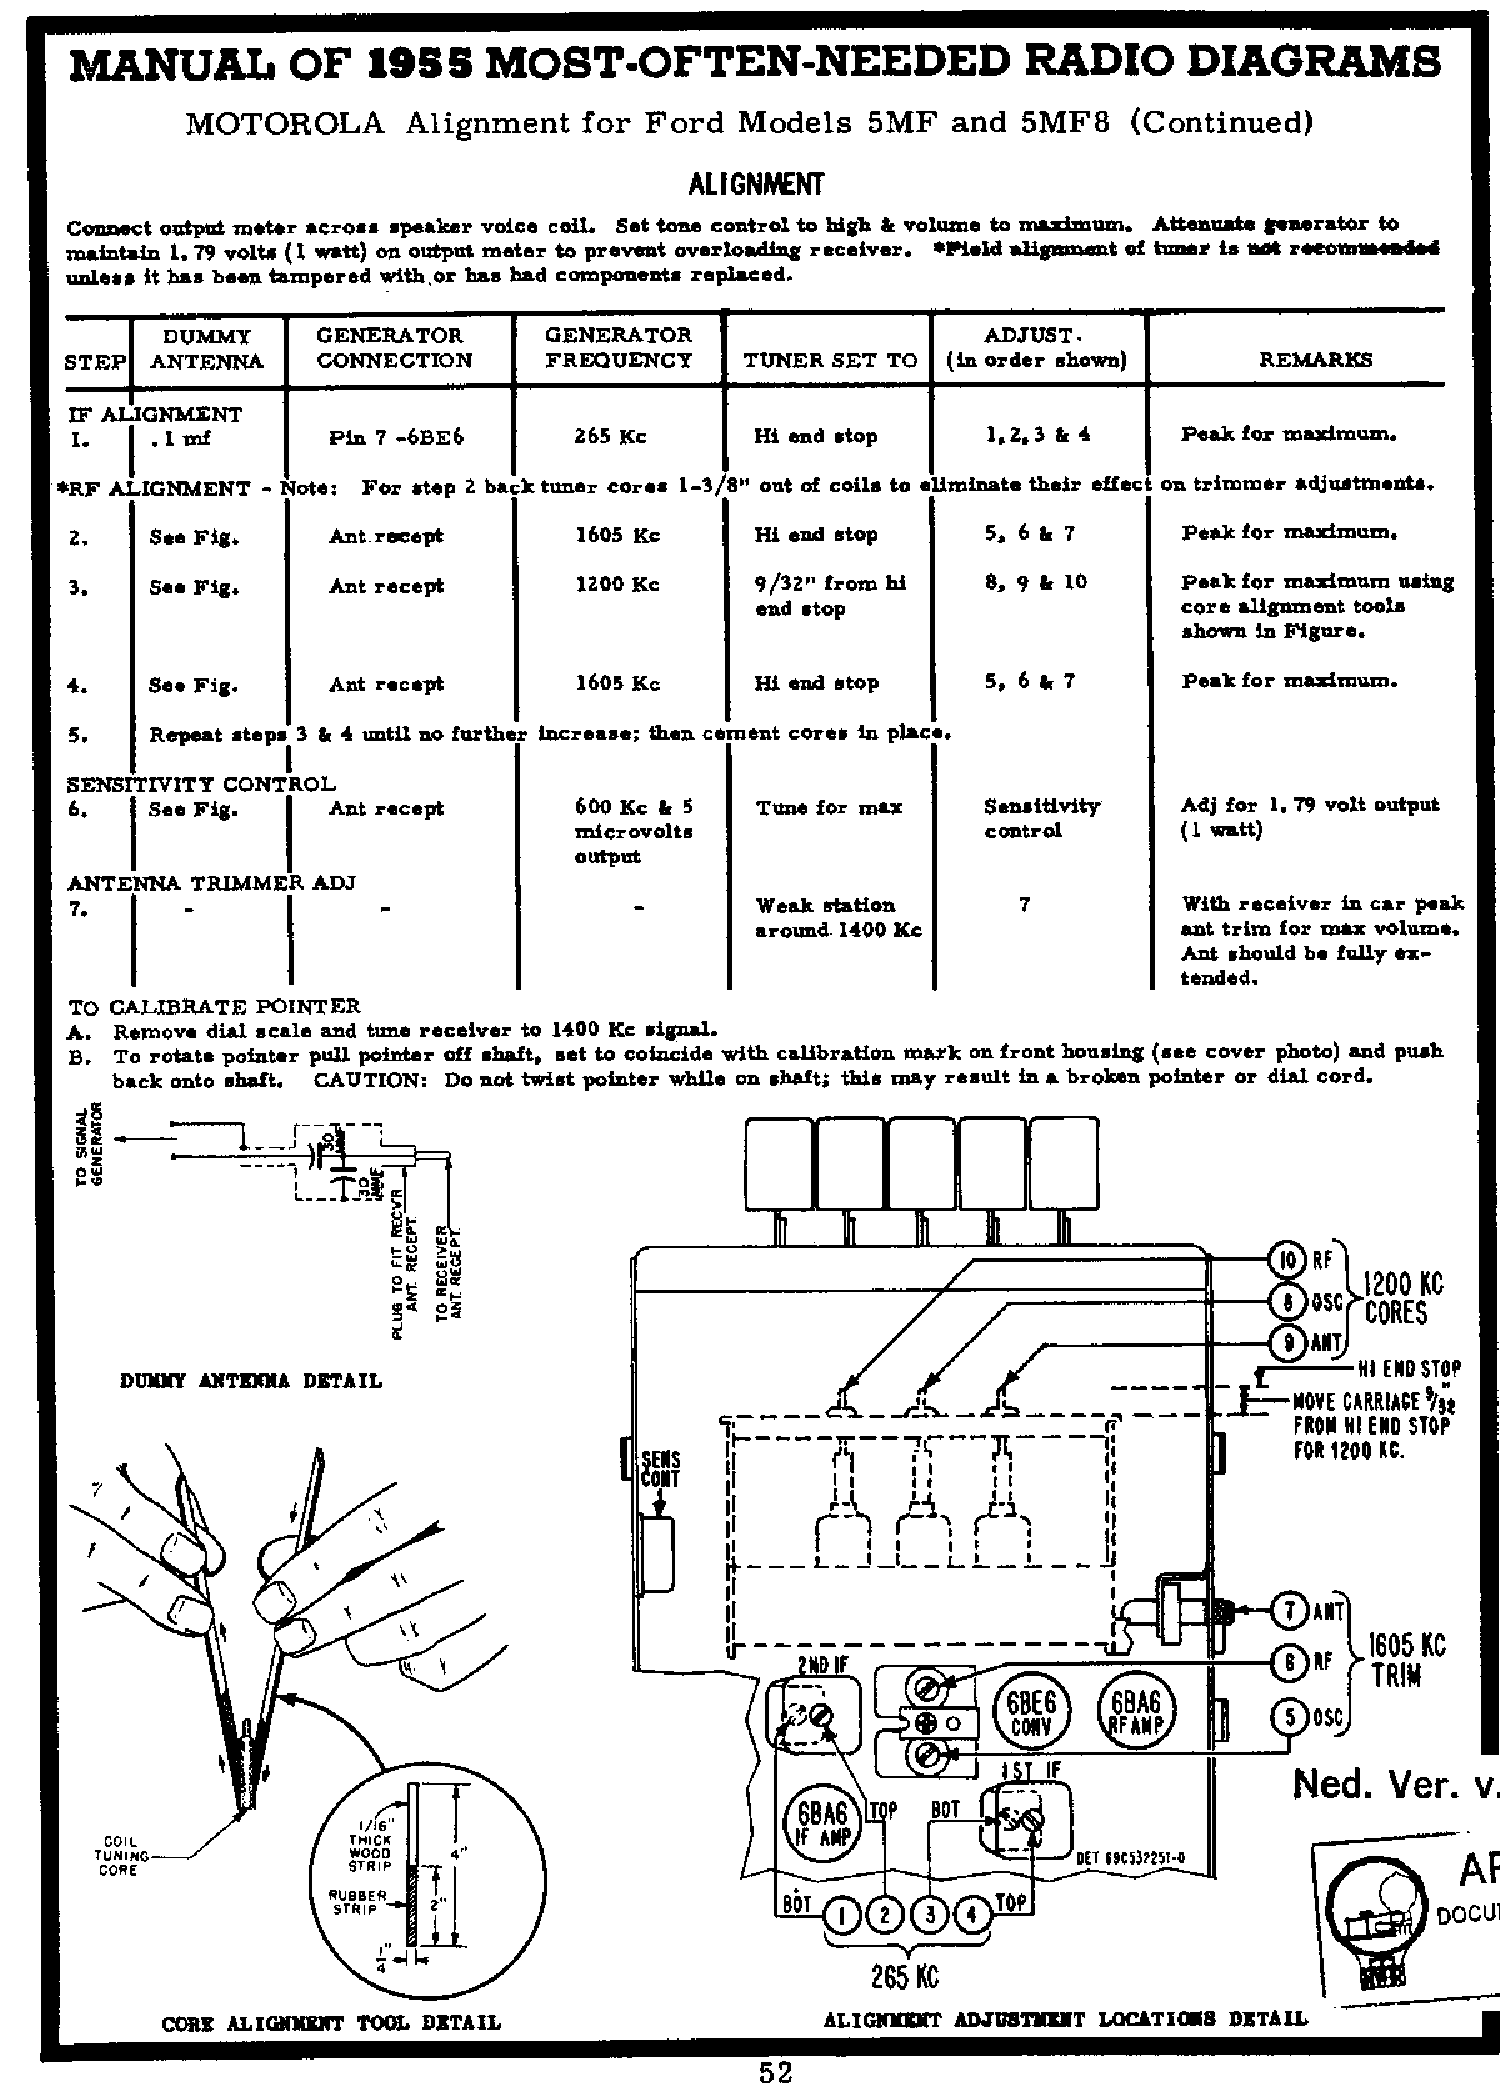 motorola 5mf8 autoradio for ford fdh18805 a2 1955 sm service manual rh elektrotanya com Chilton Repair Manuals PDF Ford Focus Haynes Repair Manual